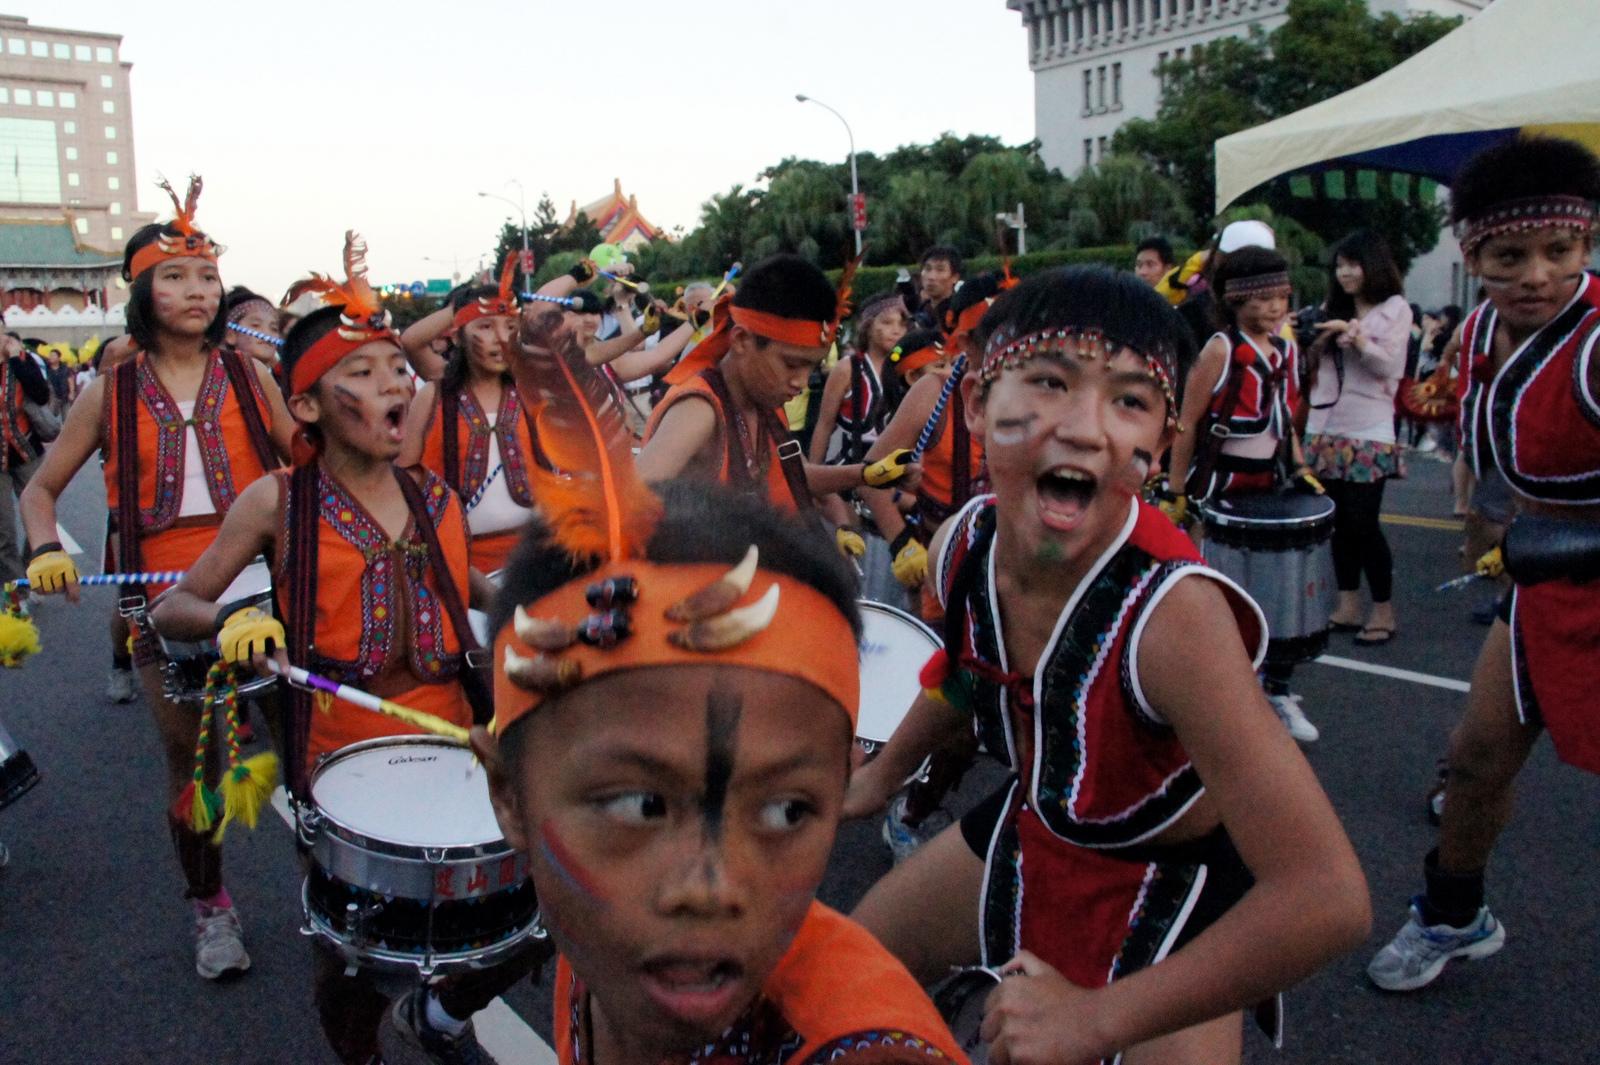 Samba taiwanês